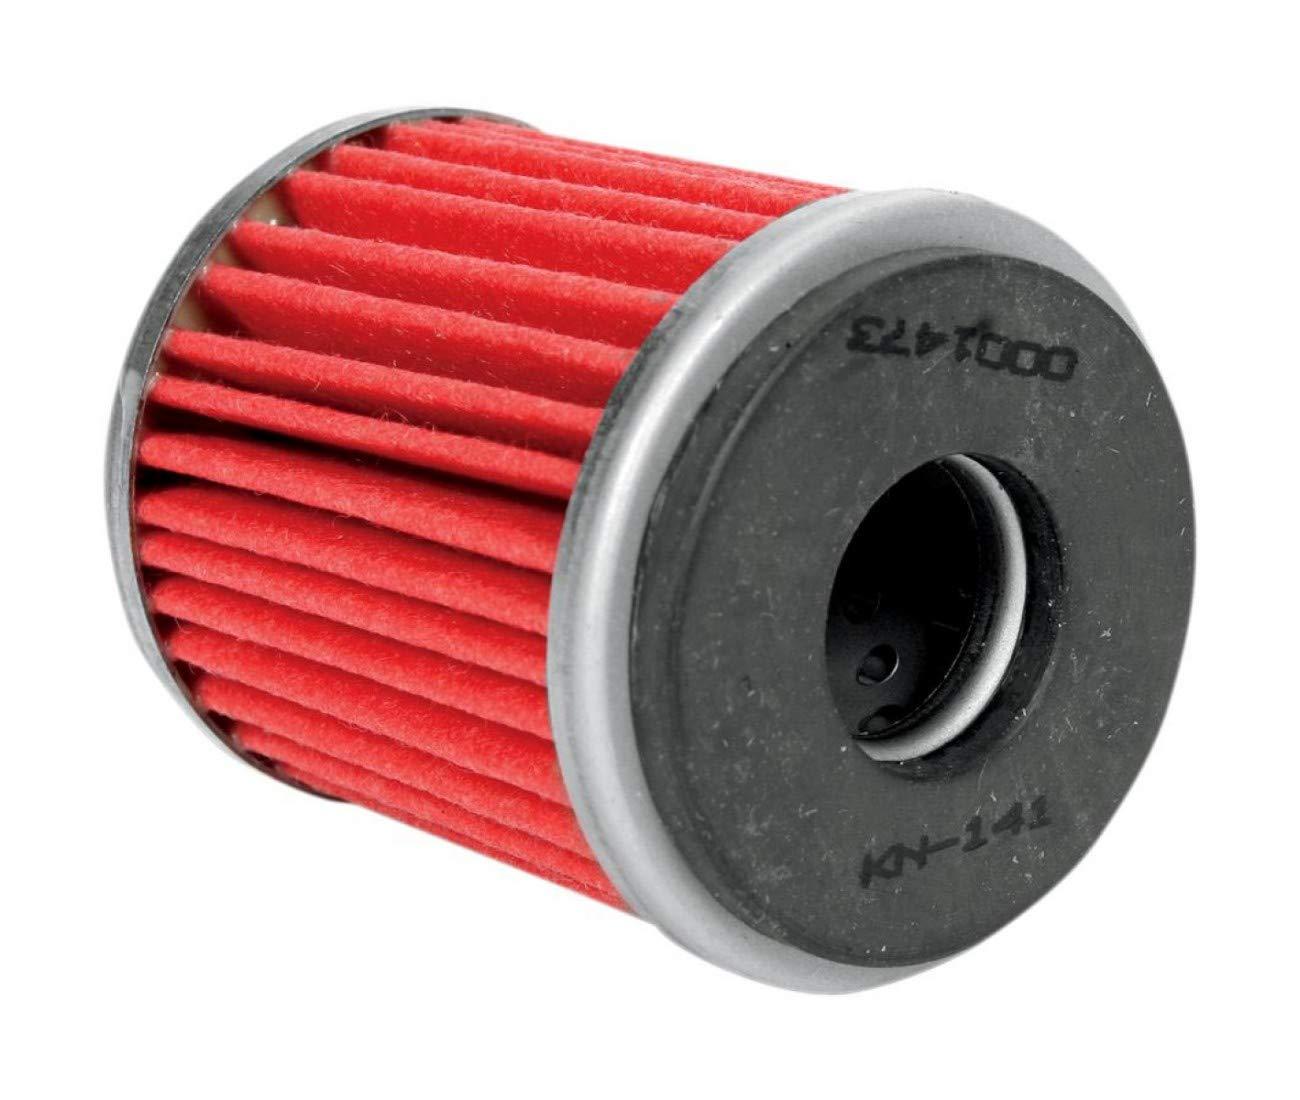 ECF 450 GAS GAS ECF 250 FILTRE A HUILE KN141